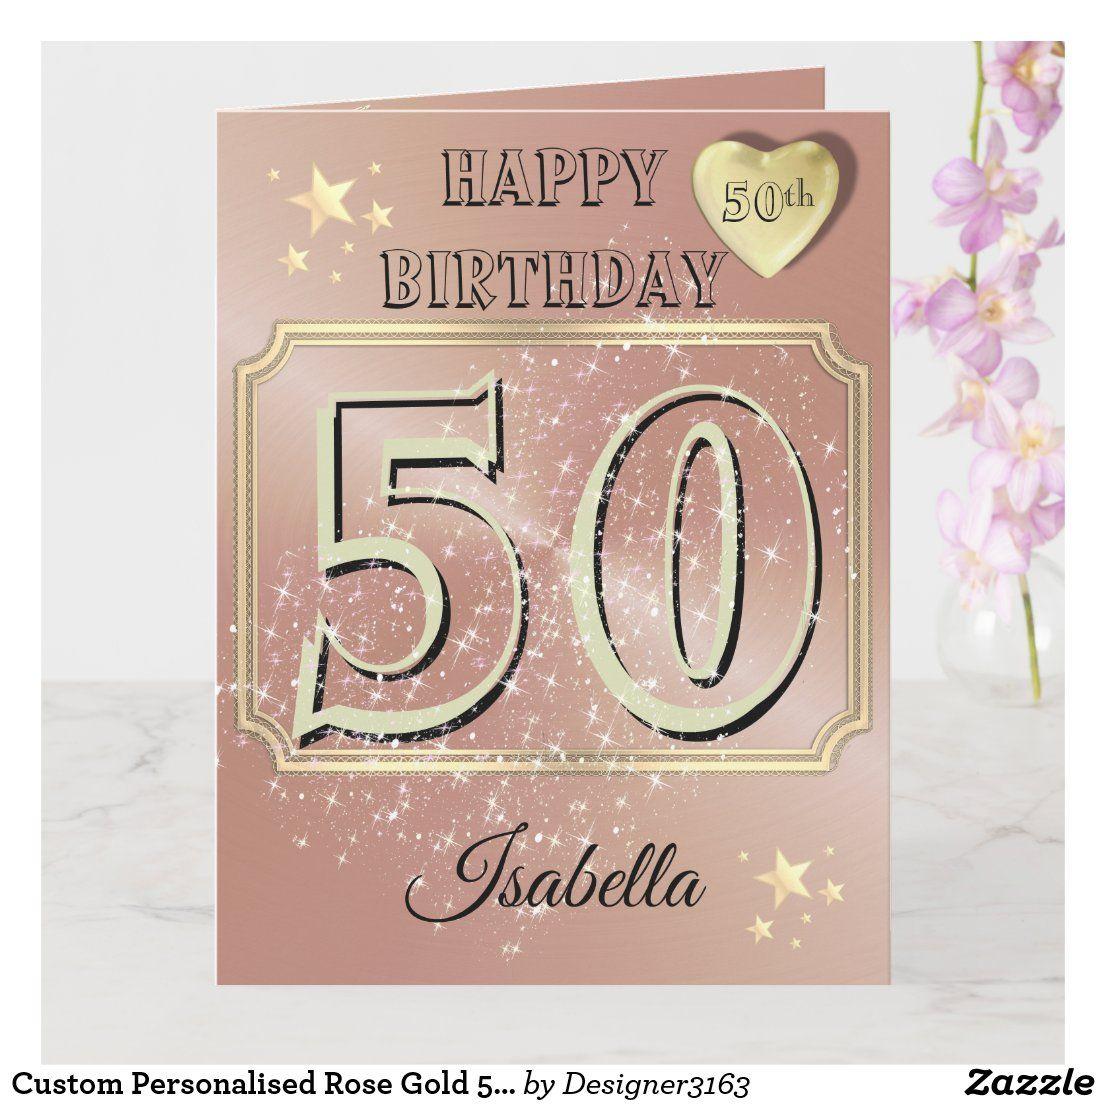 Custom Personalised Rose Gold 50th Birthday Card Zazzle Com Birthday Cards Birthday Cards For Mum 50th Birthday Greetings